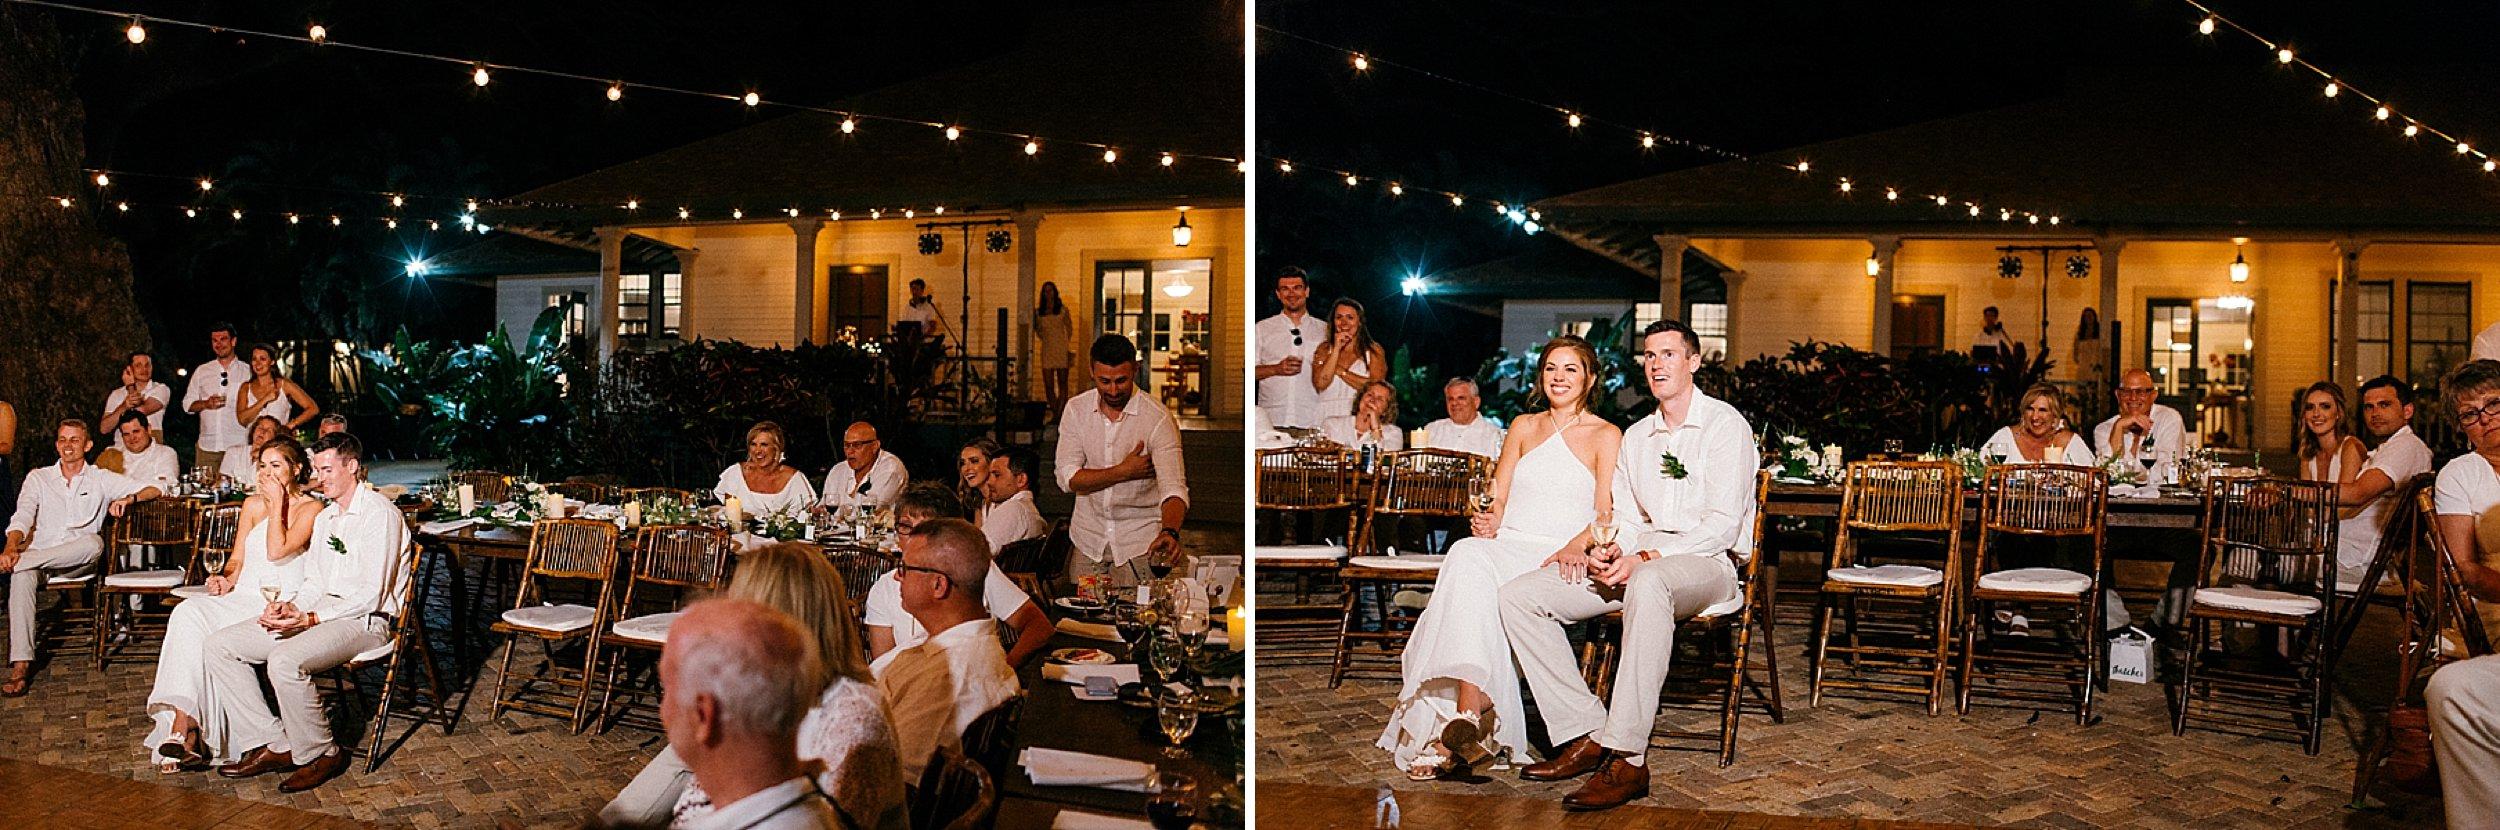 maui-wedding-at-olowalu-plantation-house_0116.jpg